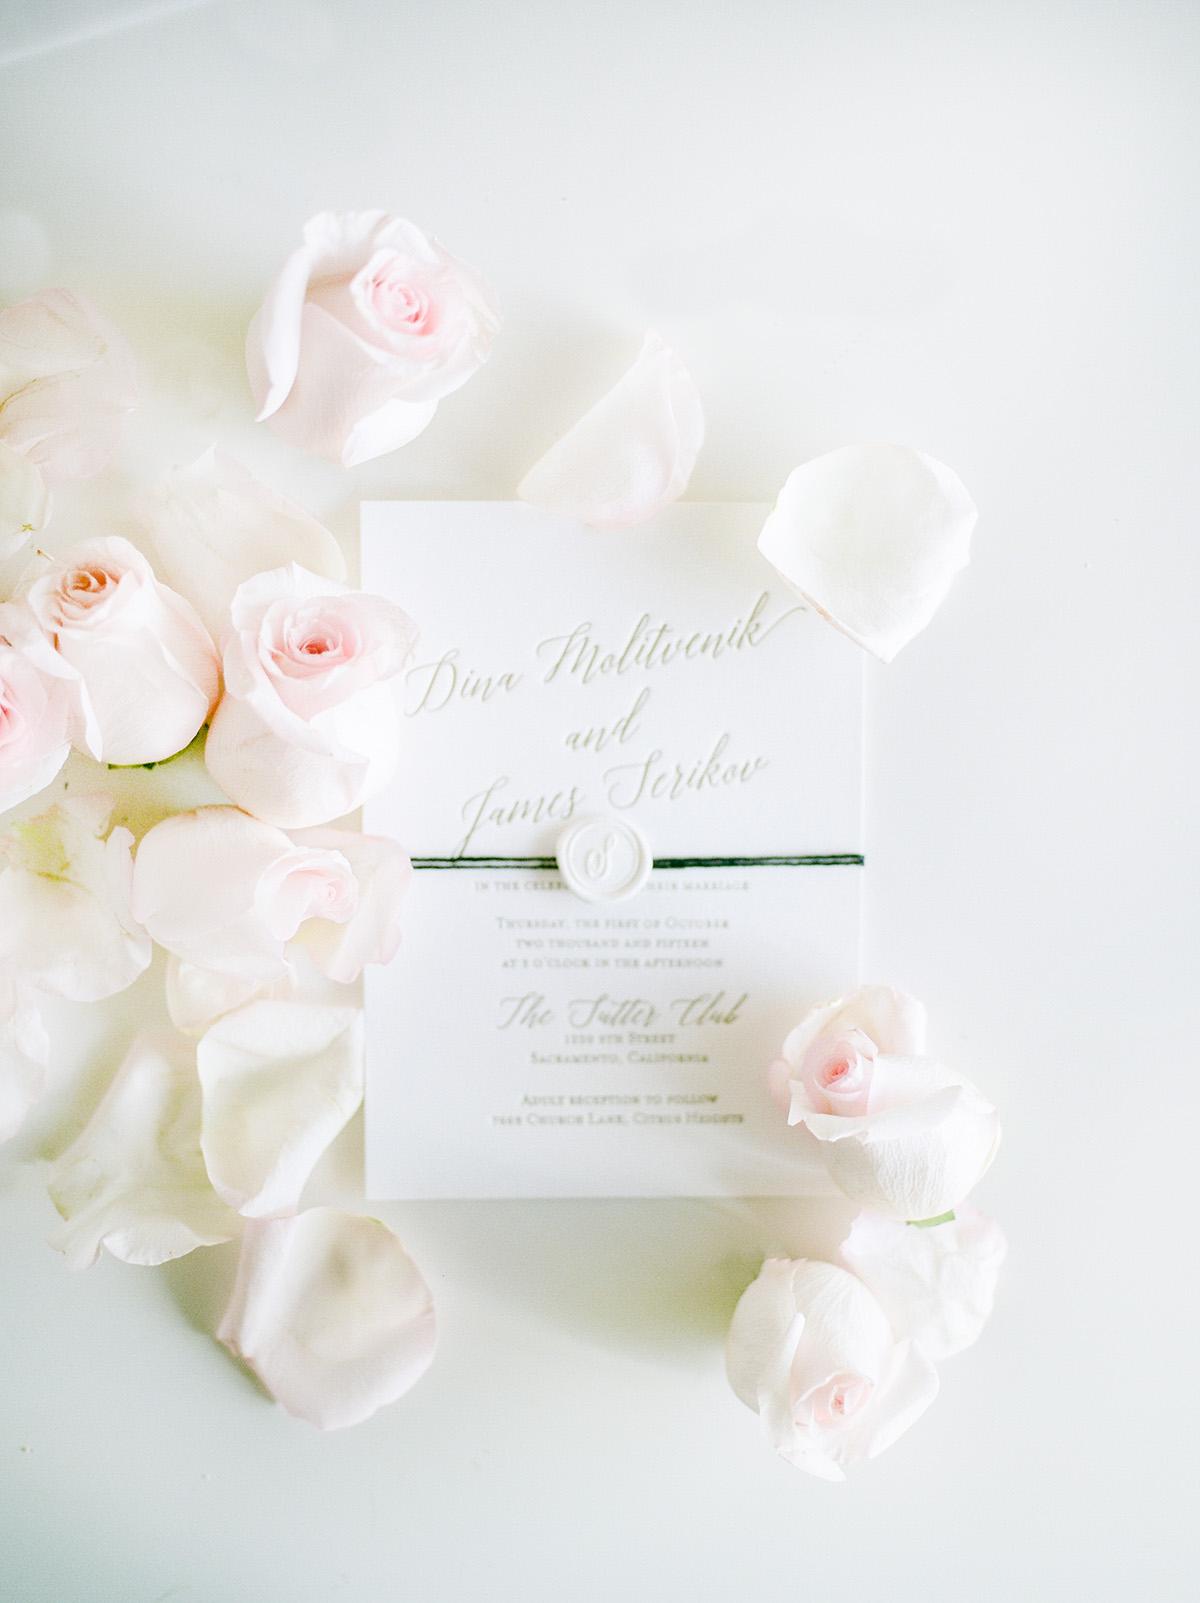 Wedding invitation, wedding album